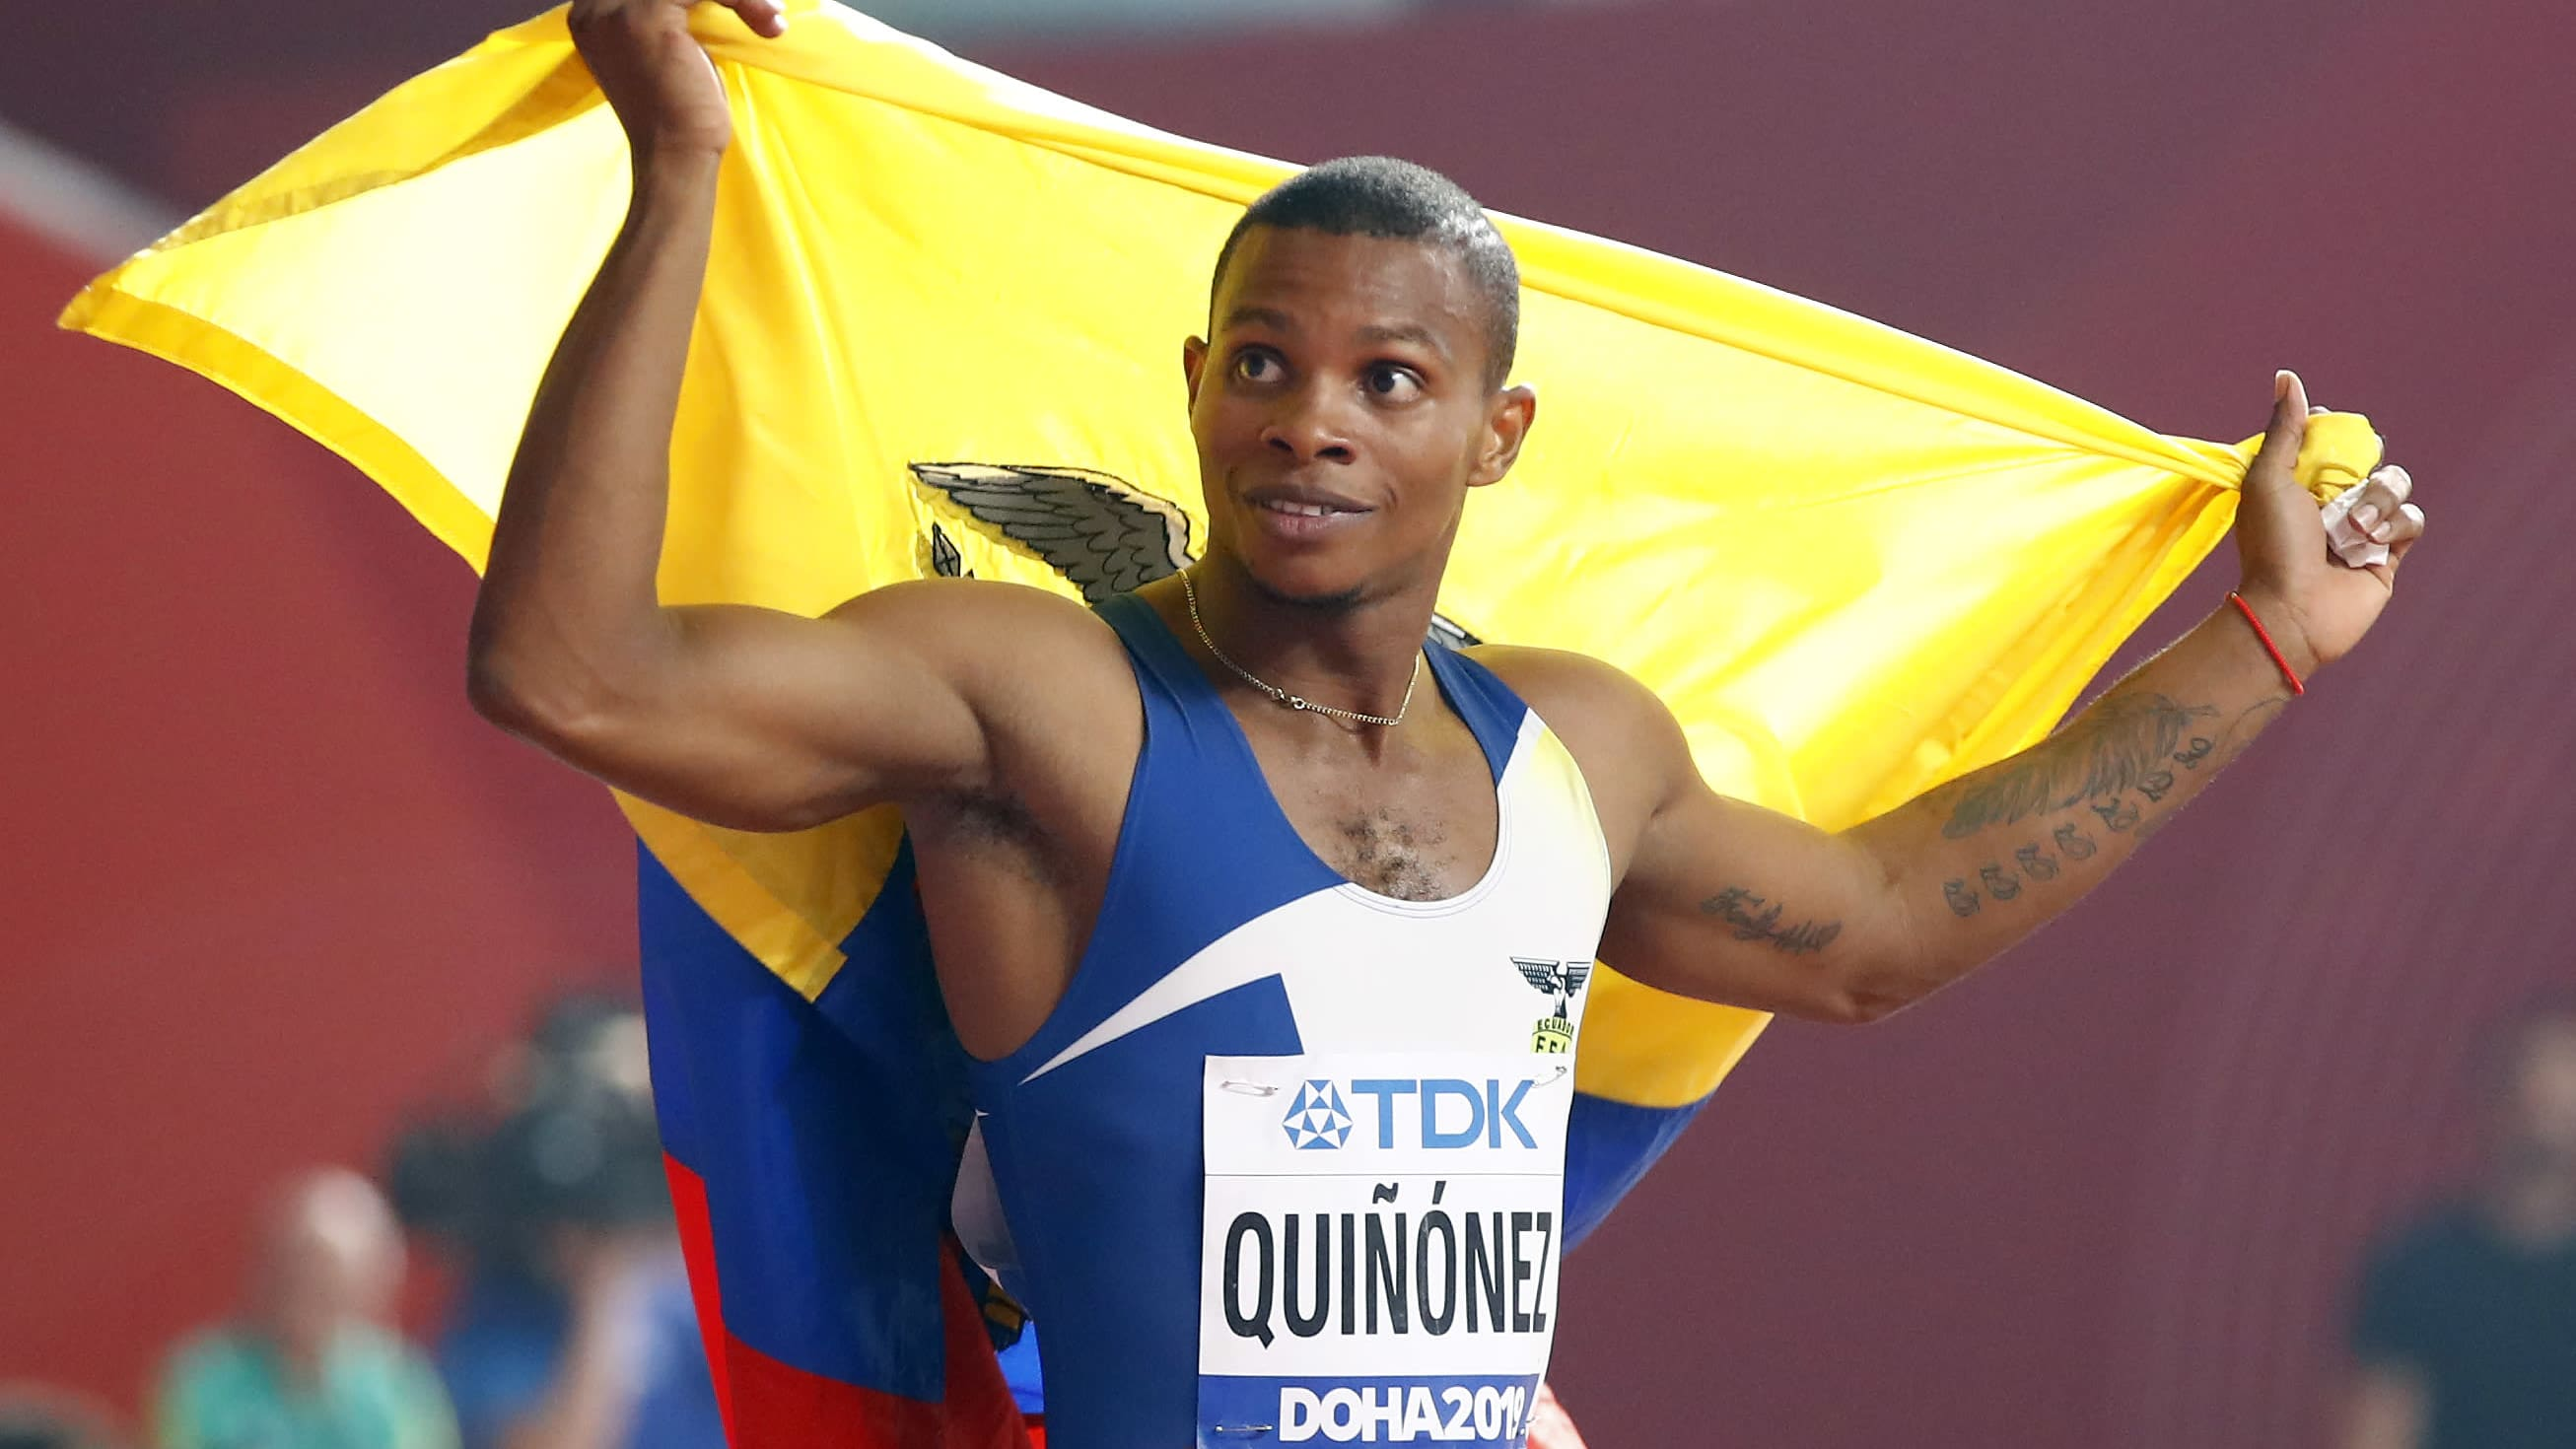 Alex Quinonez saavutti MM-pronssia miesten 200 metrillä Qatarin Dohassa.